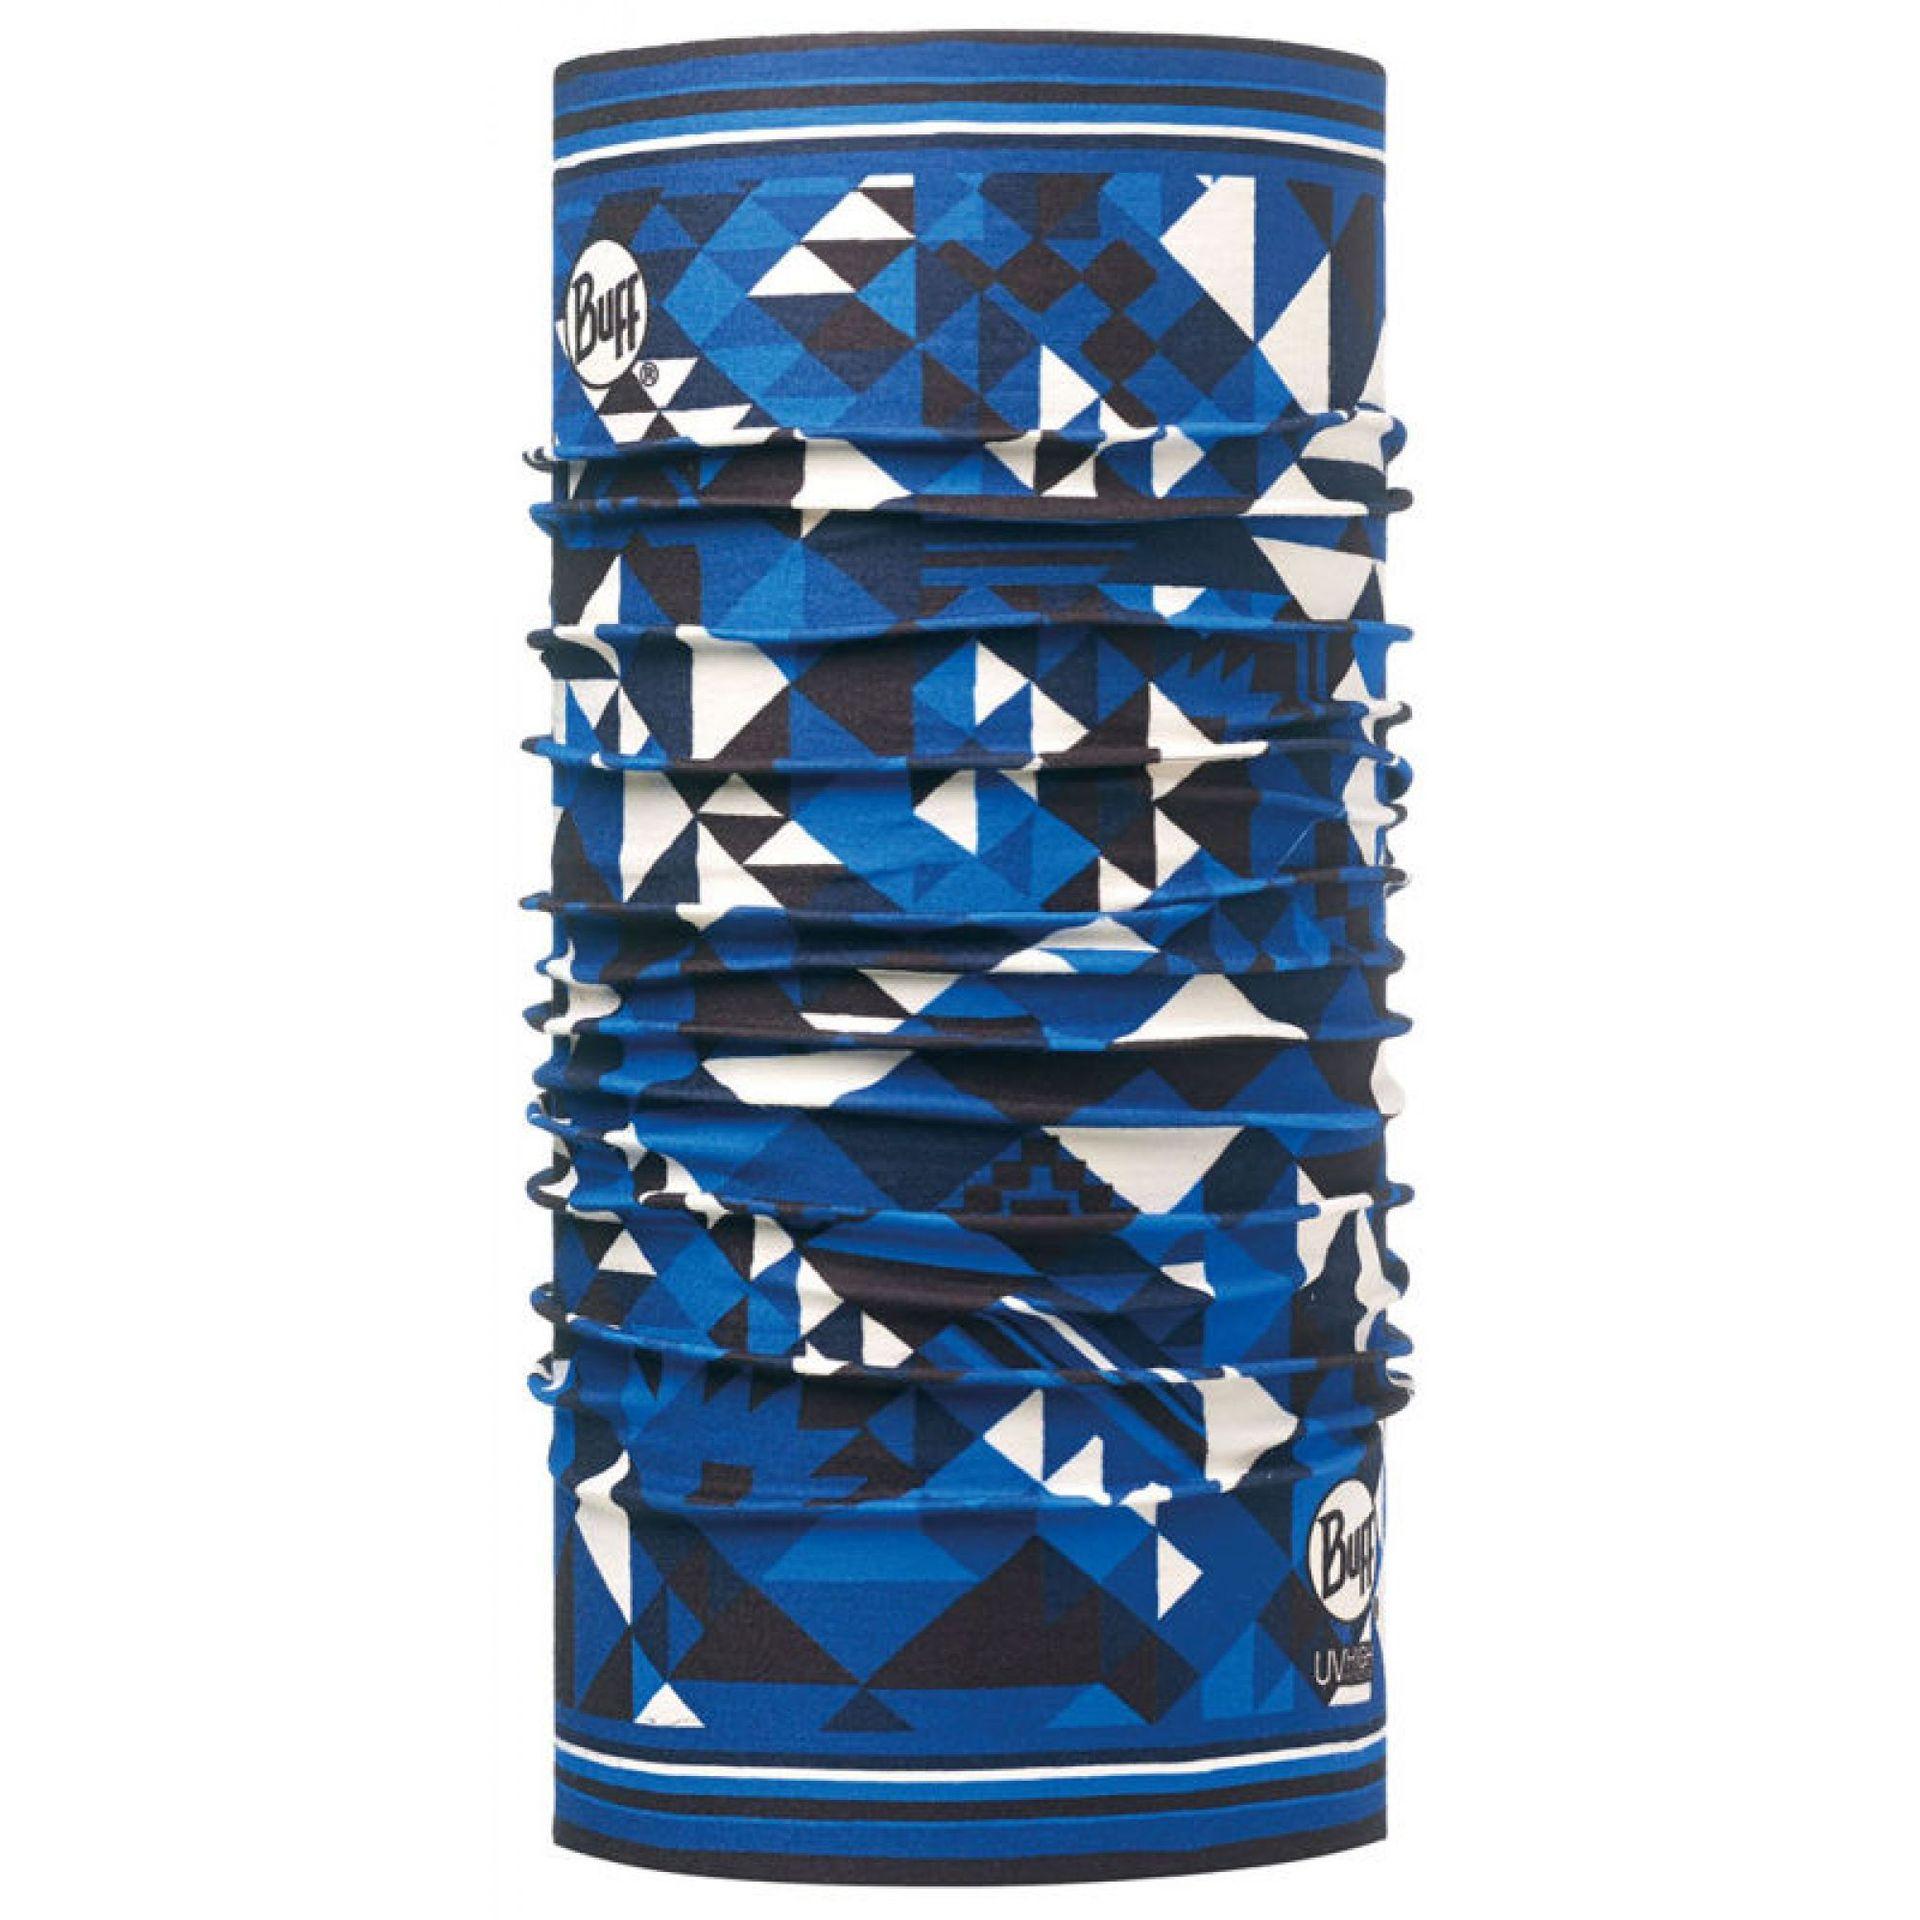 CHUSTA BUFF HIGH UV PROTECTION PIPAW BLUE